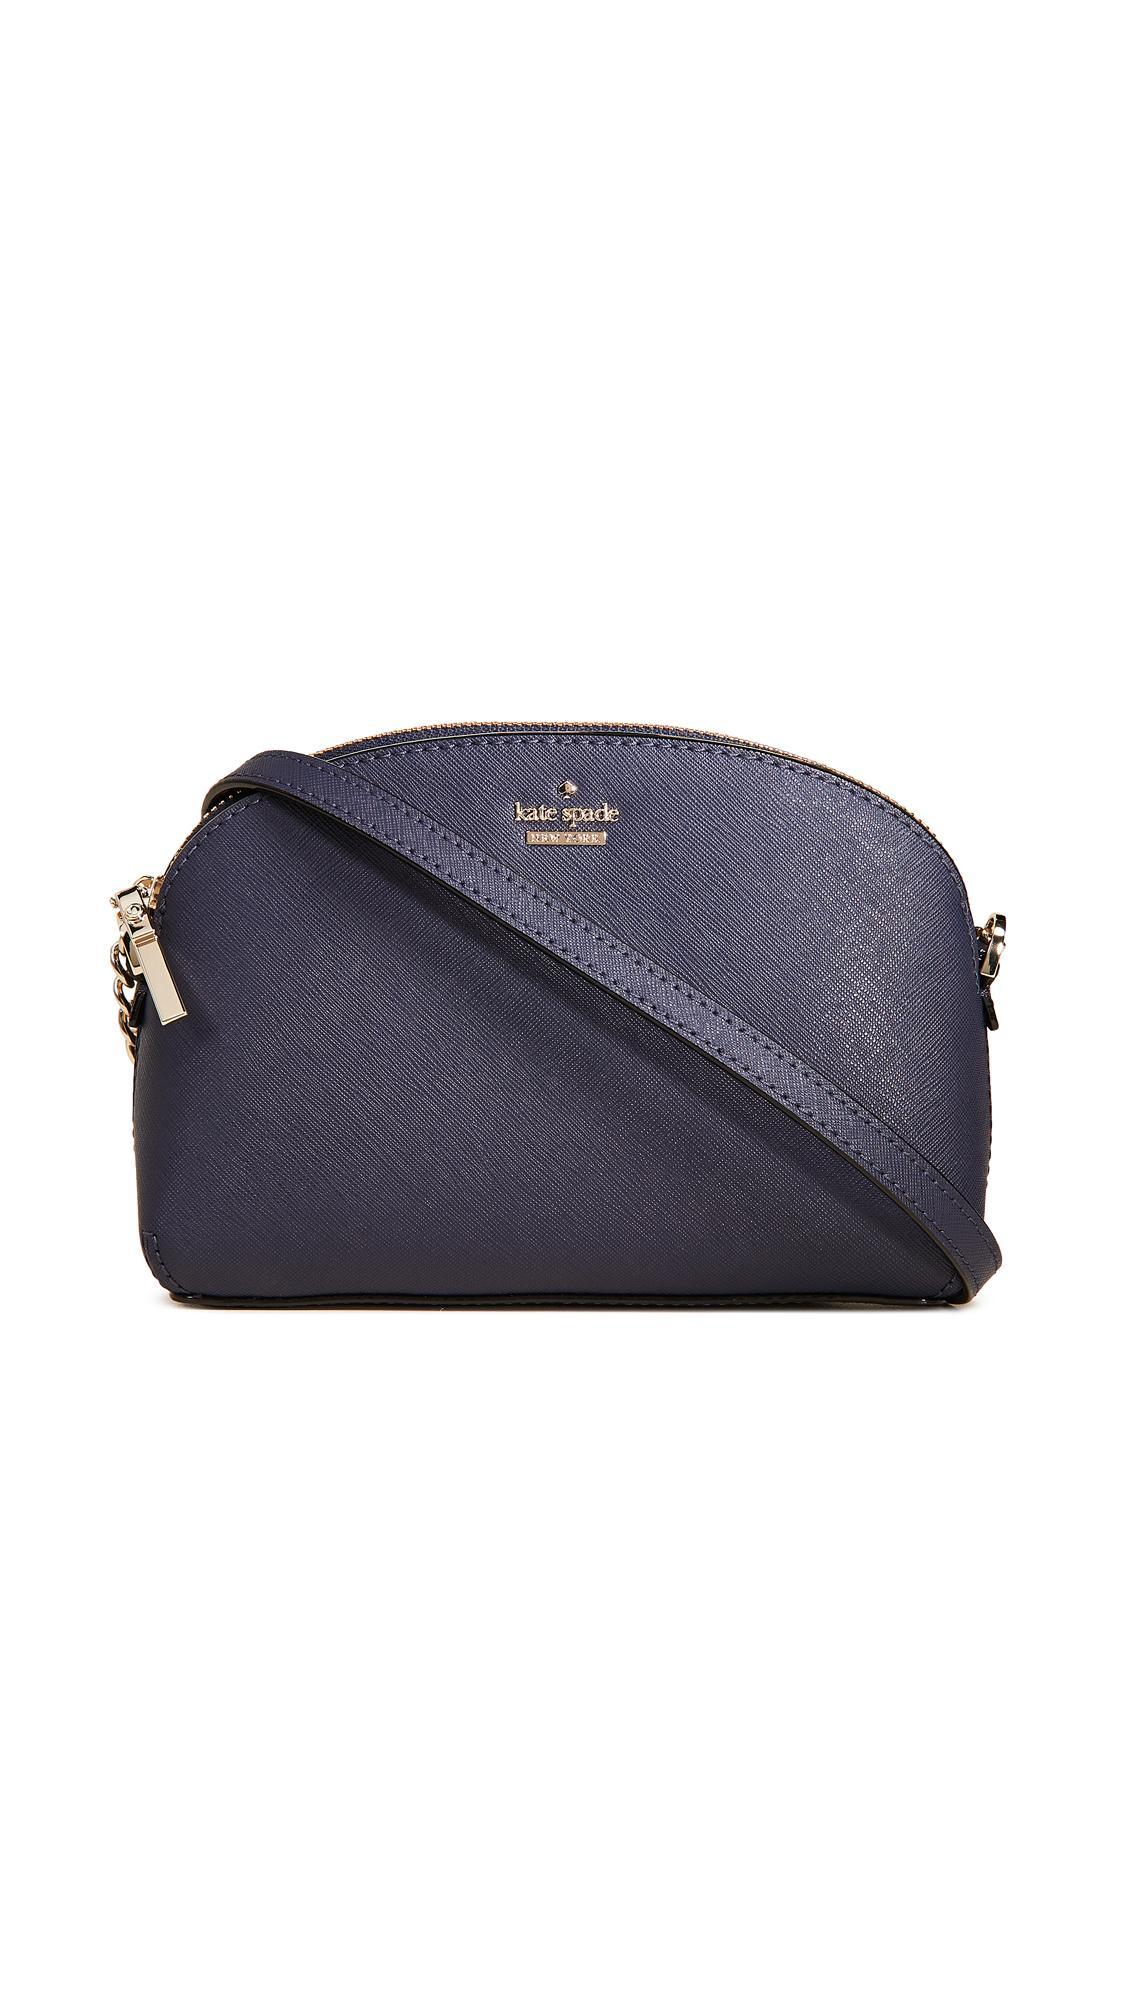 98d584273 Kate Spade Cameron Street Hilli Cross Body Bag In Blazer Blue | ModeSens